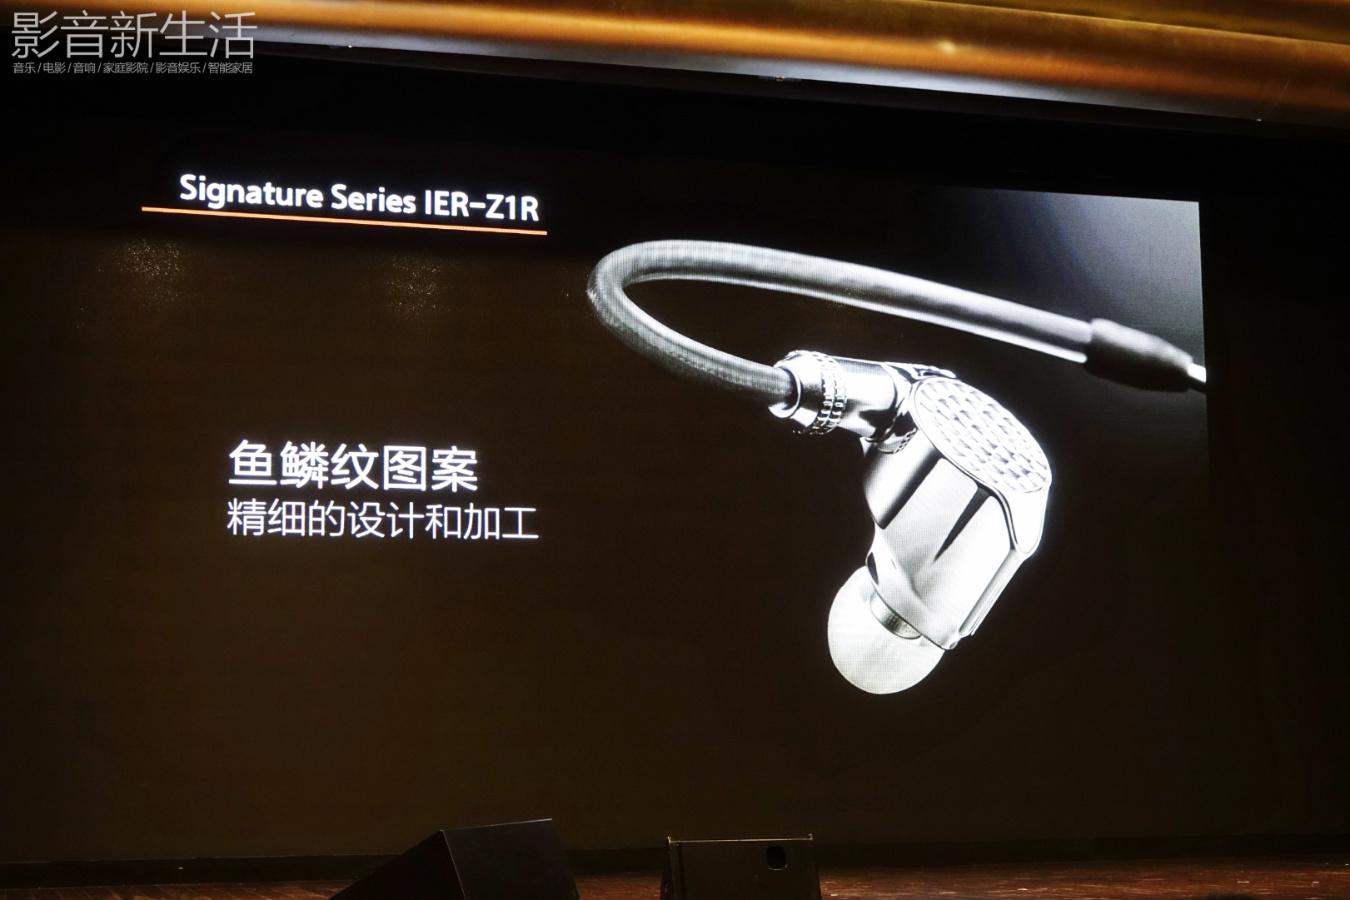 "Sony Hi Res 2018 36 - 新品 | ""重塑随身音乐娱乐王朝!"":Sony索尼发布Signature醇音系列新兄弟IER-Z1R和DMP-Z1,以及舞台监听耳机系列:IER-M7和IER-M9,还有升级款MDR-Z7M2!"